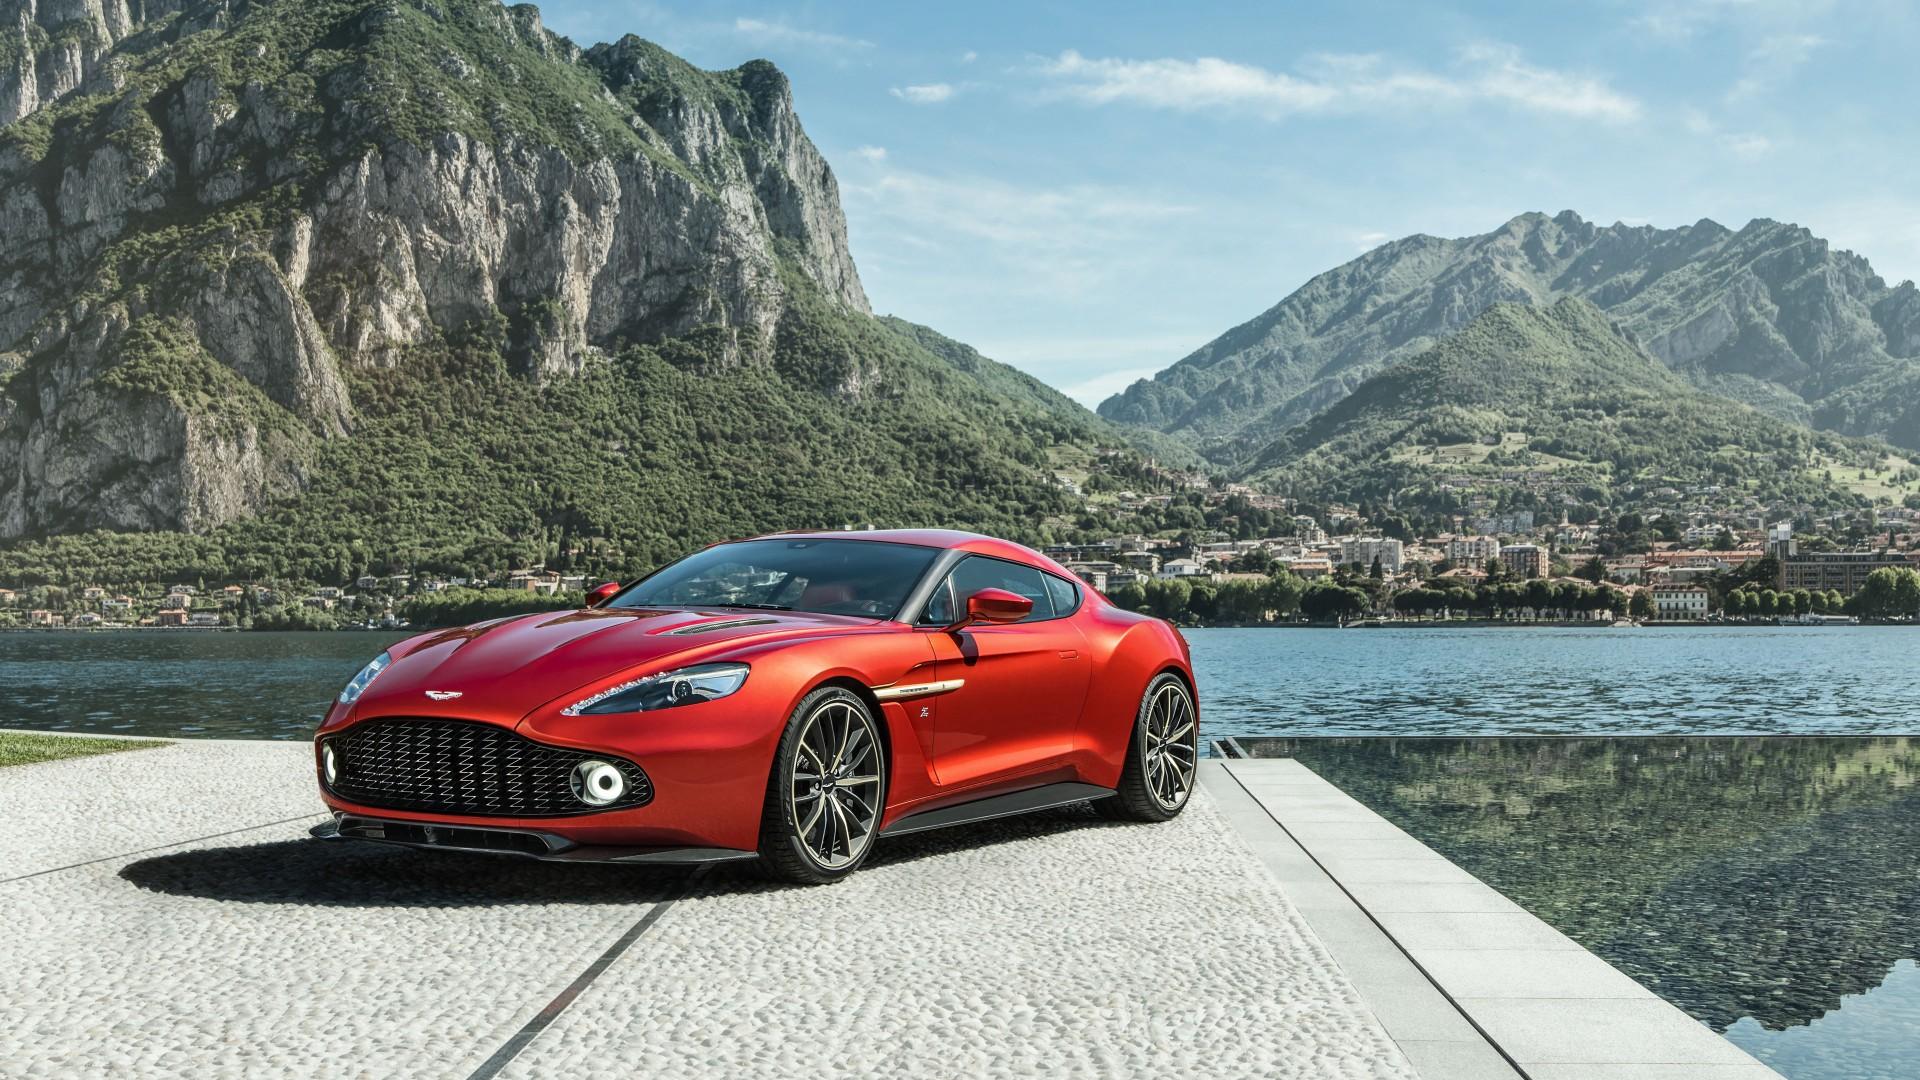 2017 Aston Martin Vanquish Zagato 5 Wallpaper Hd Car